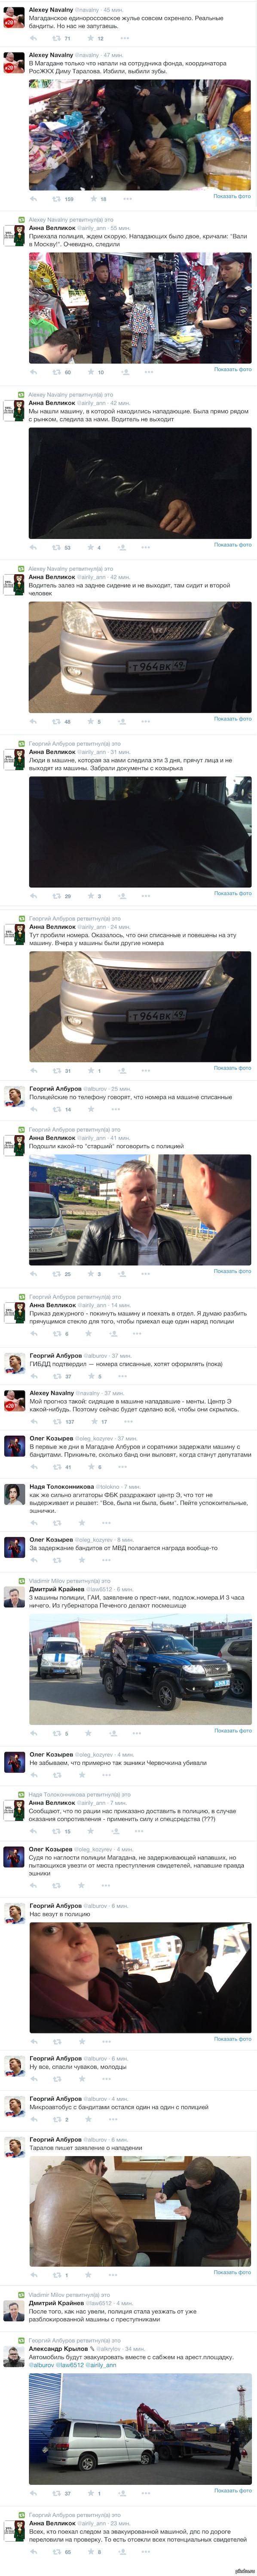 Нападение на руководителя проекта «РосЖКХ» в Магадане